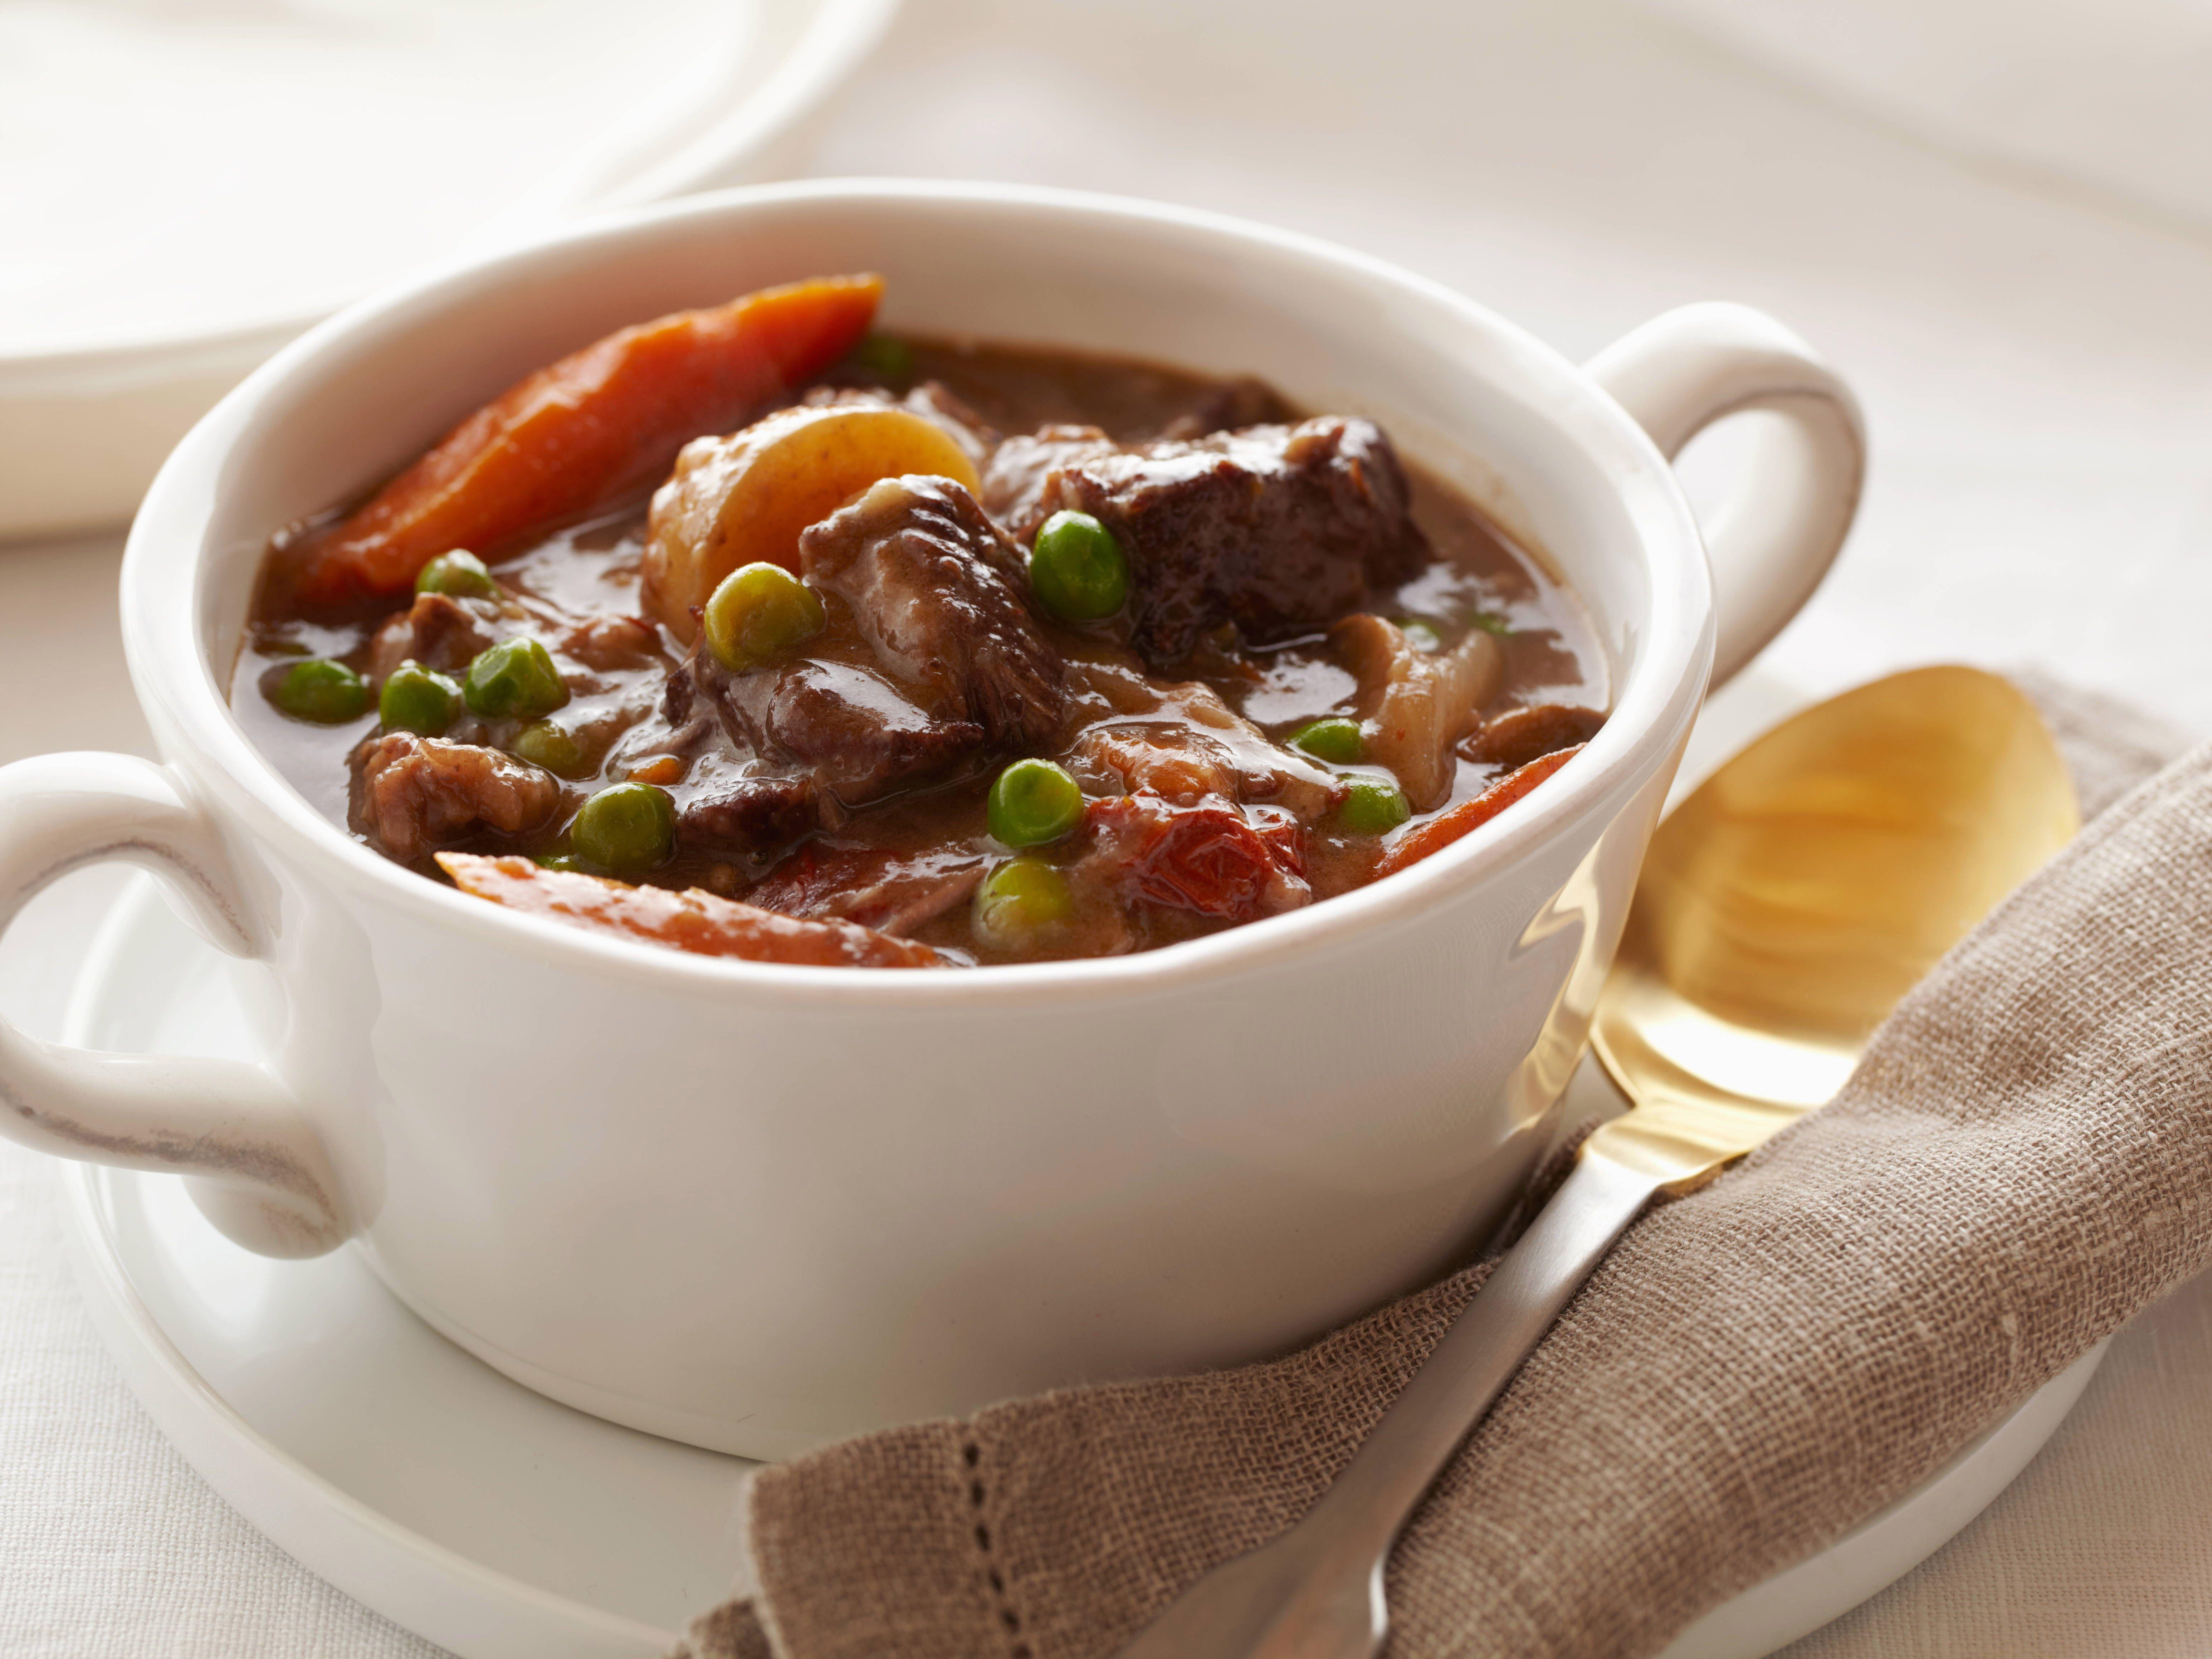 Betty crocker old fashioned beef stew 10